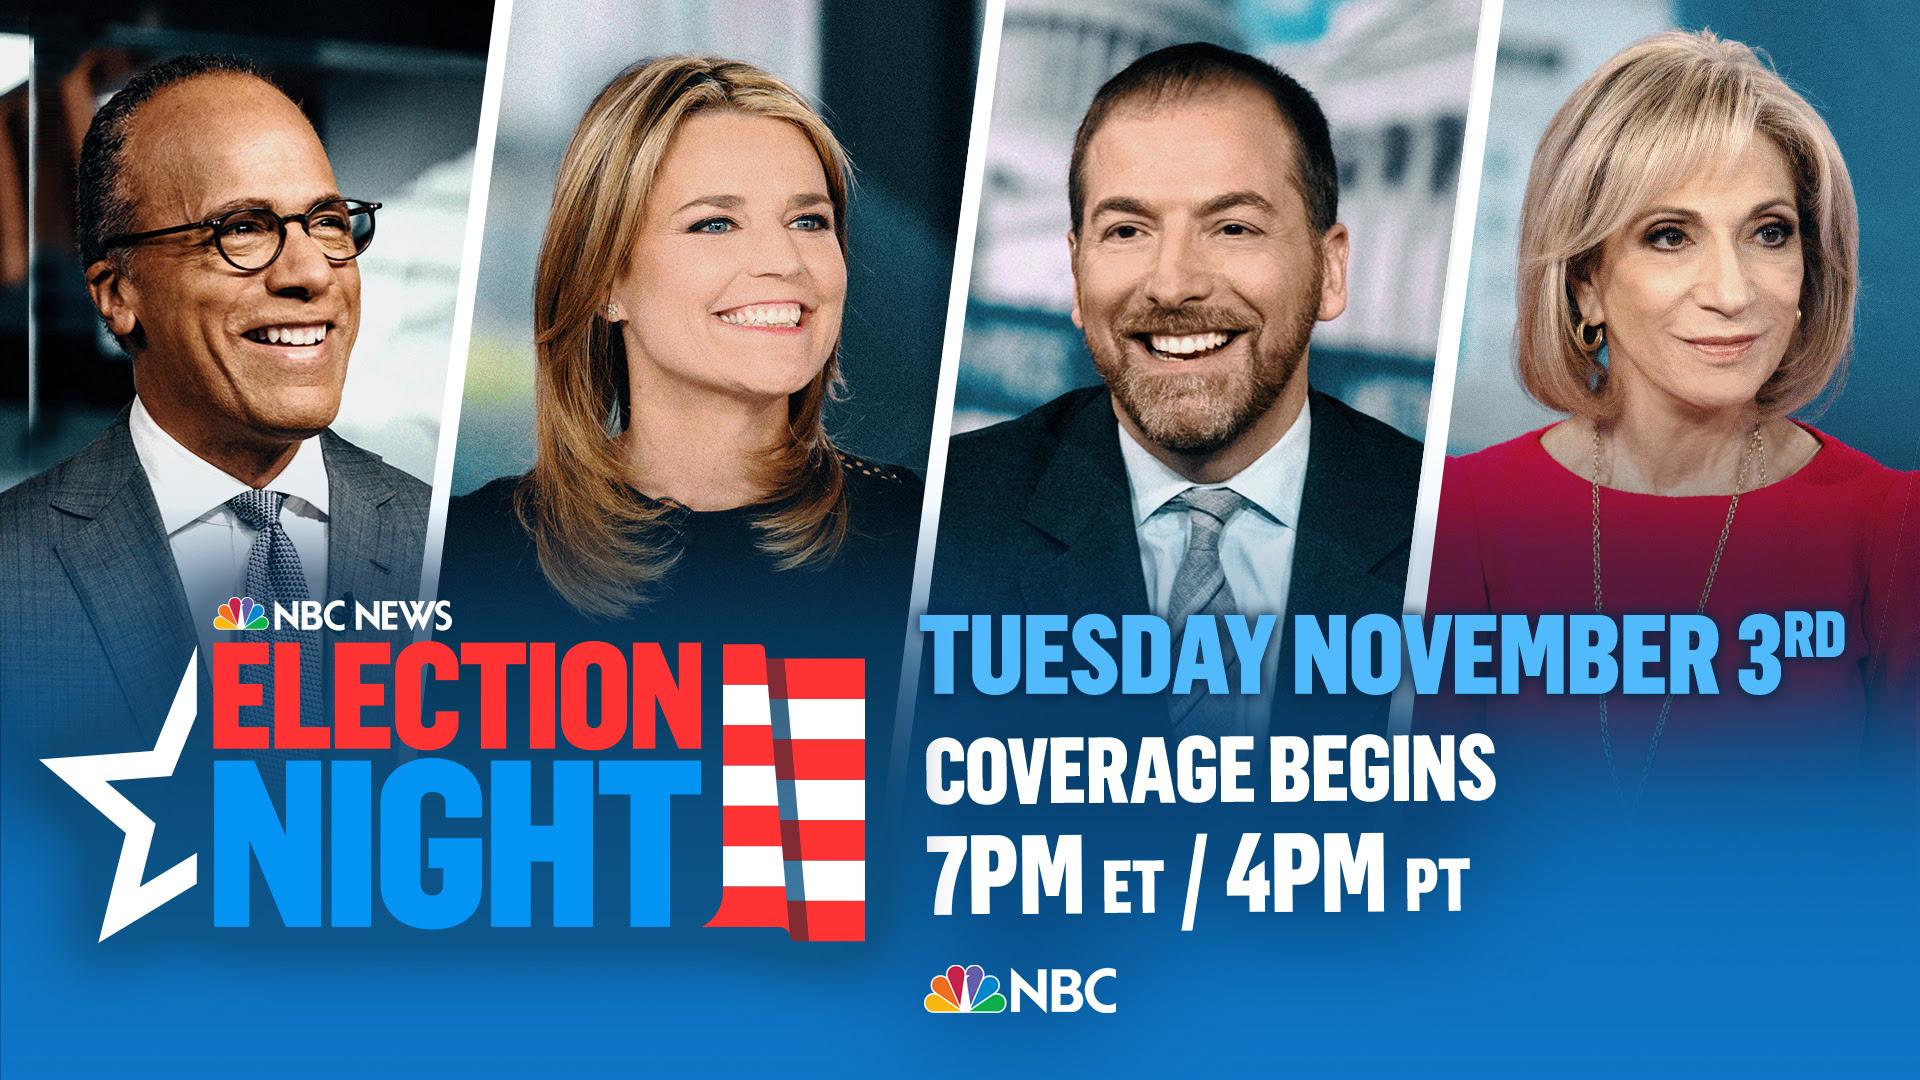 NBC News Election Coverage 2020